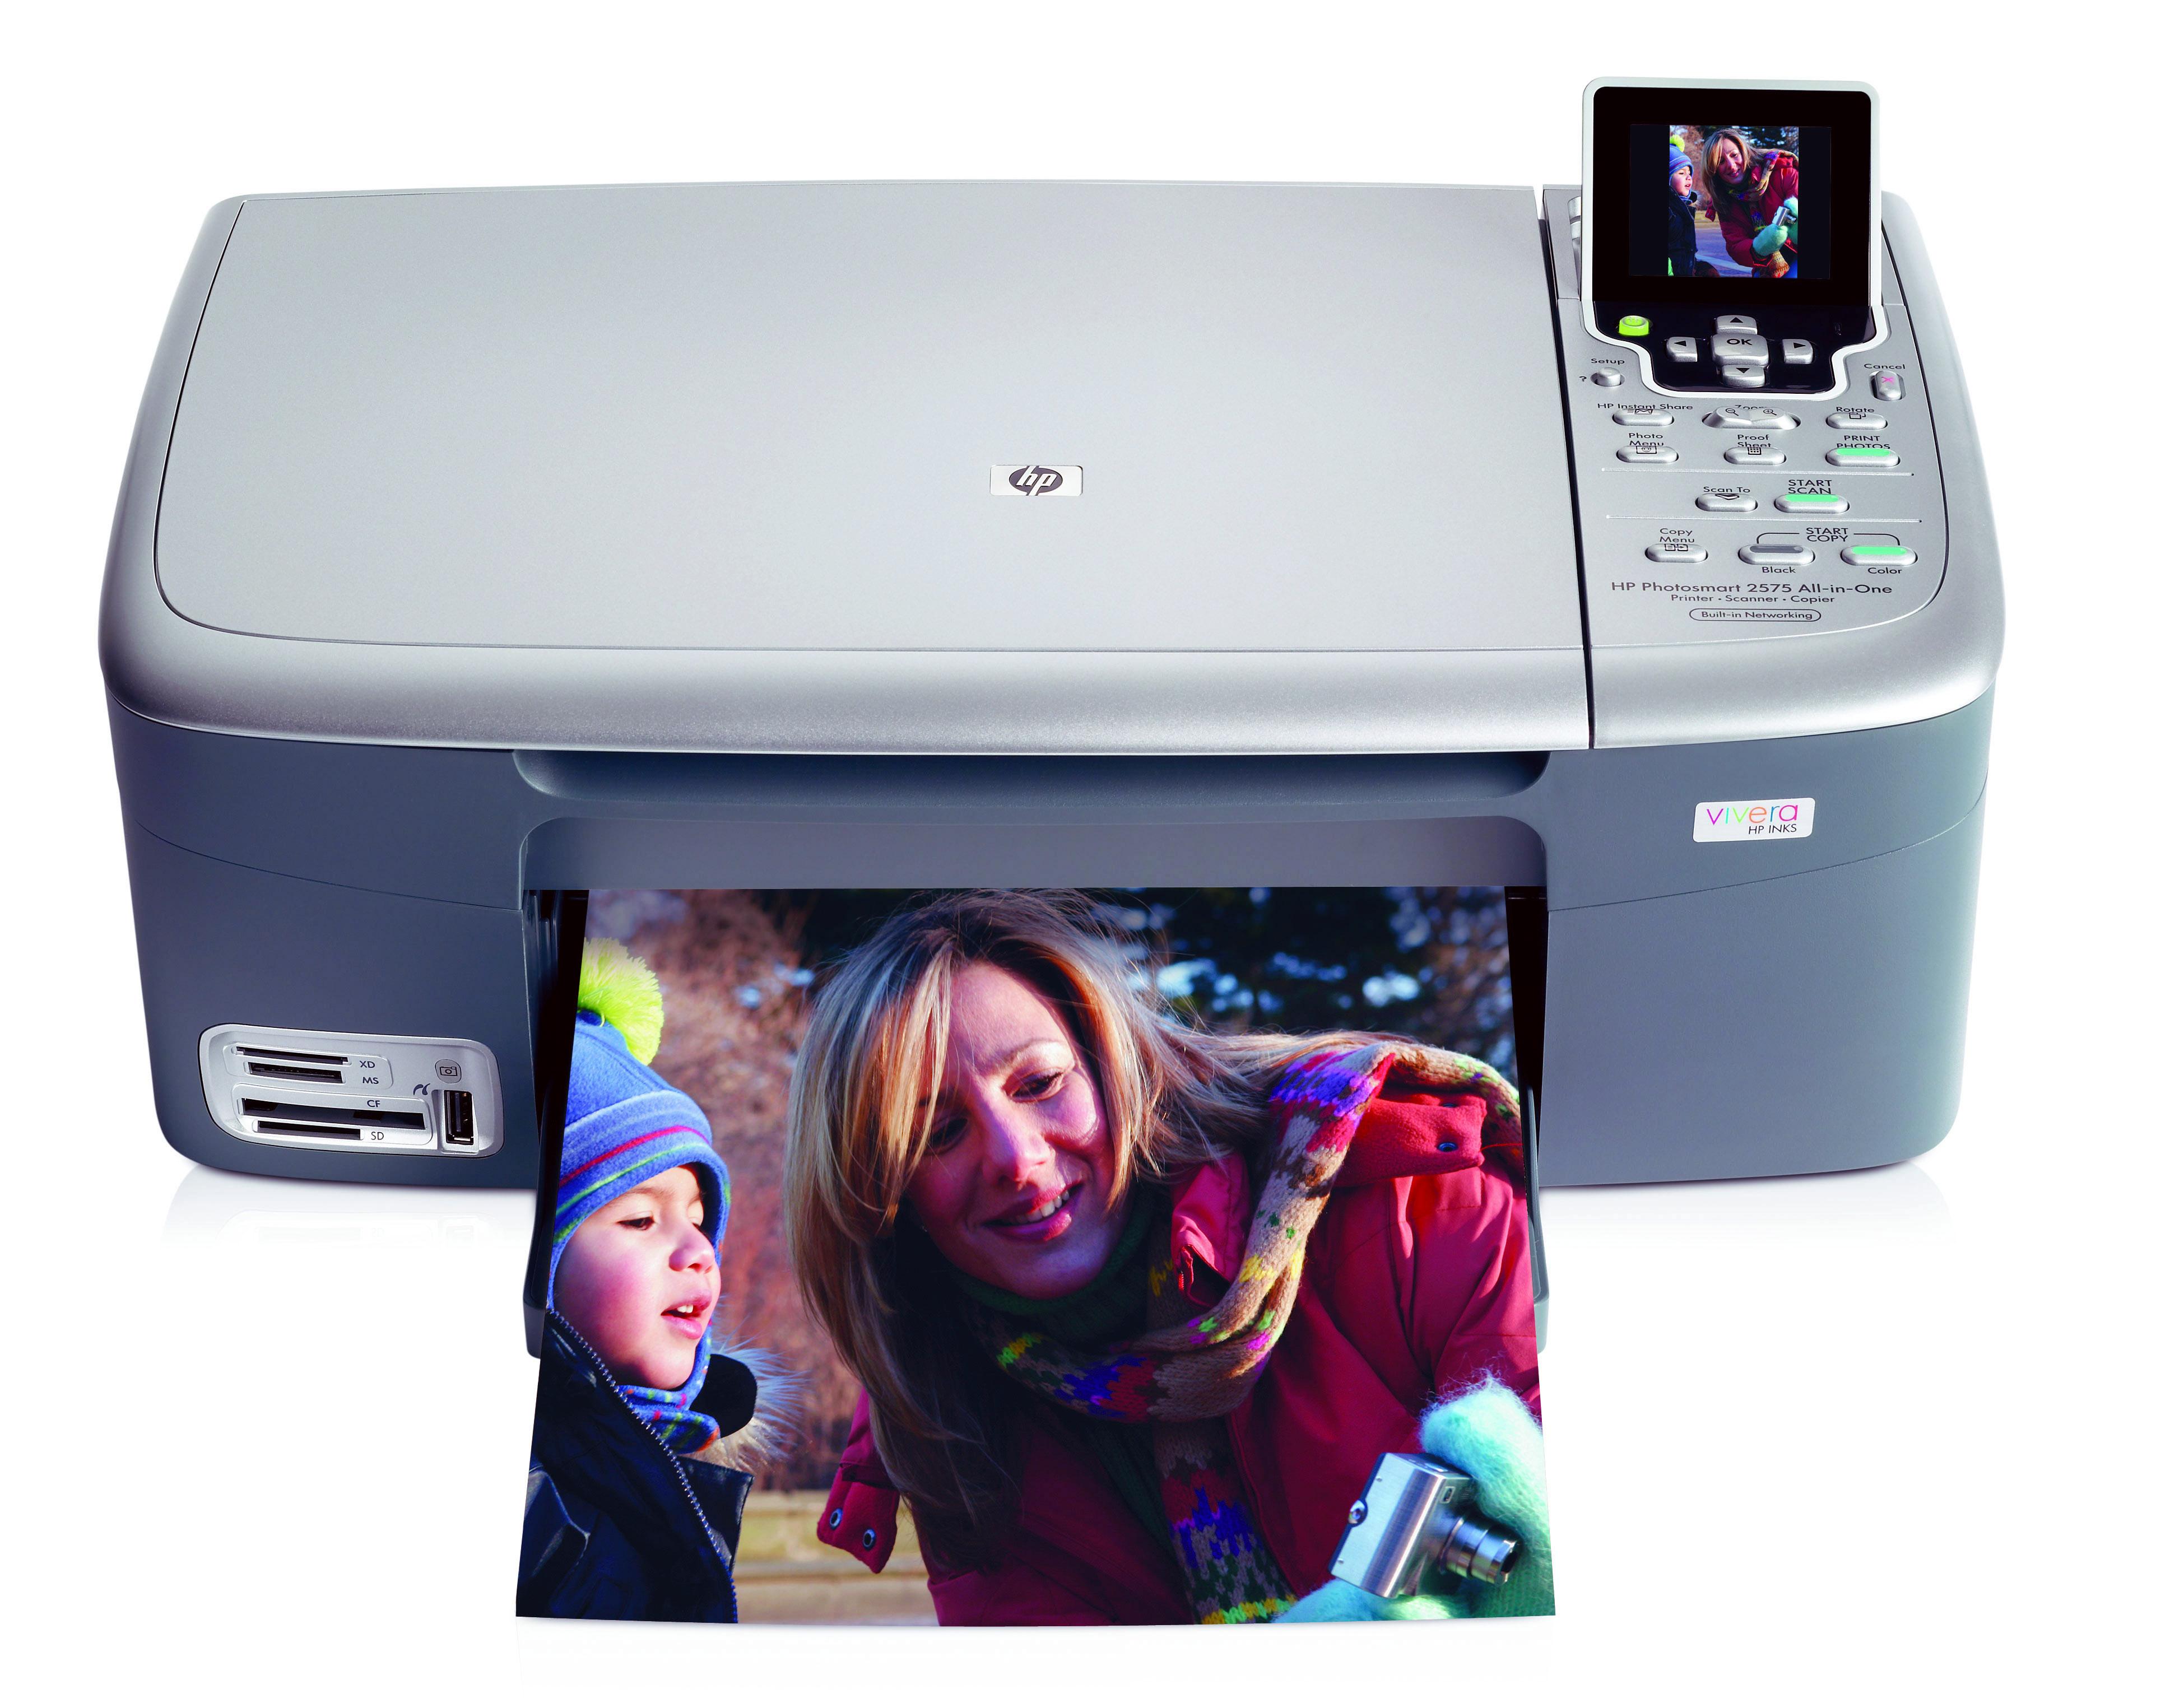 HP PhotoSmart 2575Xi